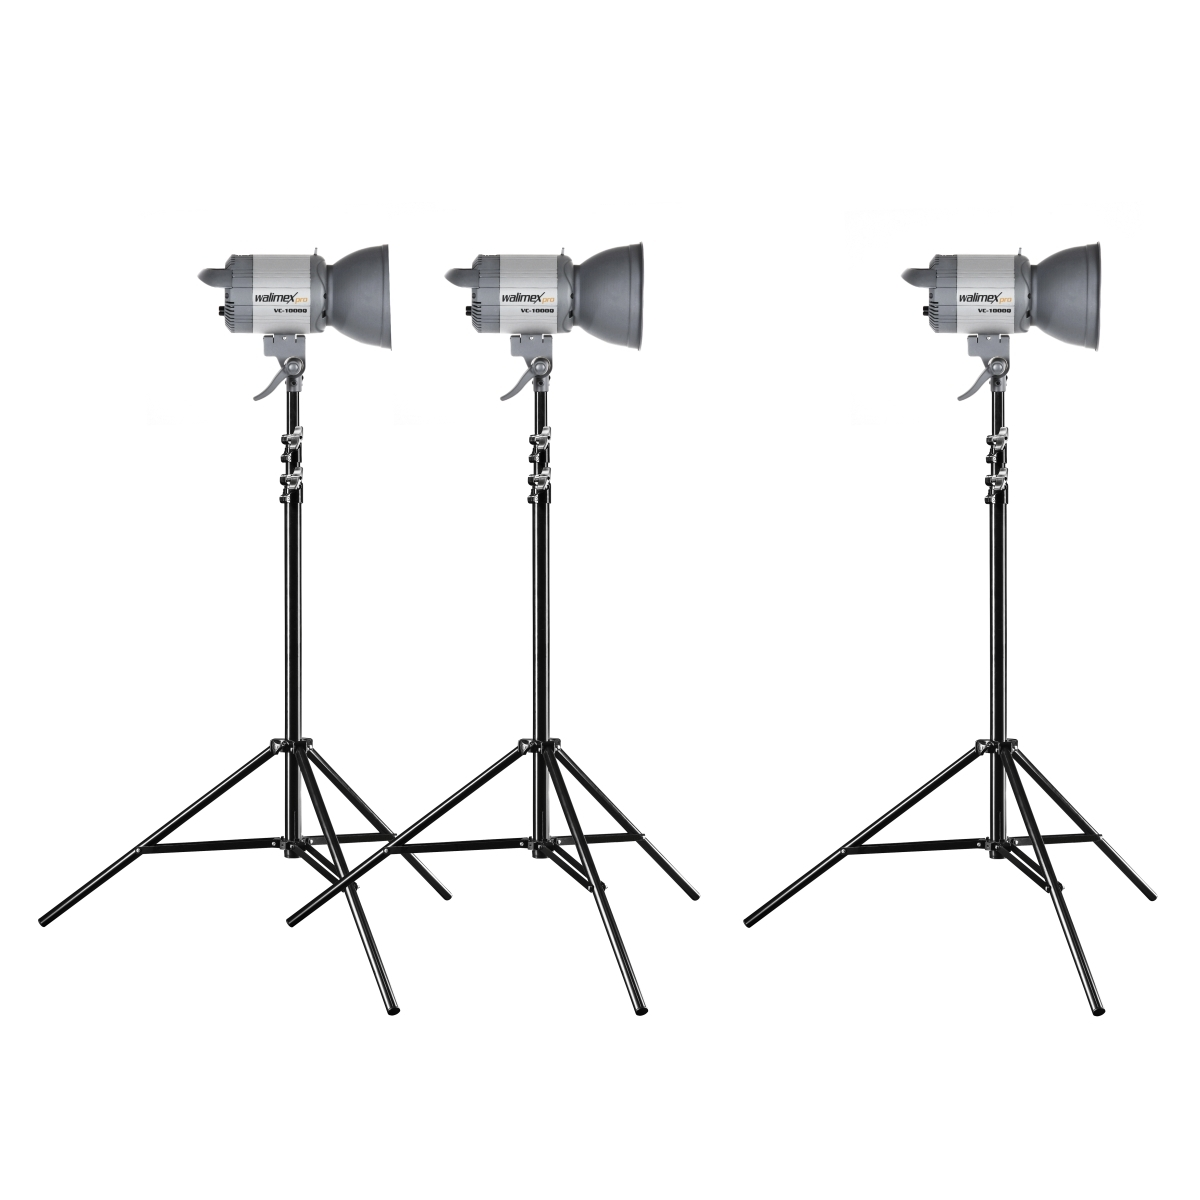 Walimex pro Set Quartz Light VC-1000Q/1000Q/1000Q